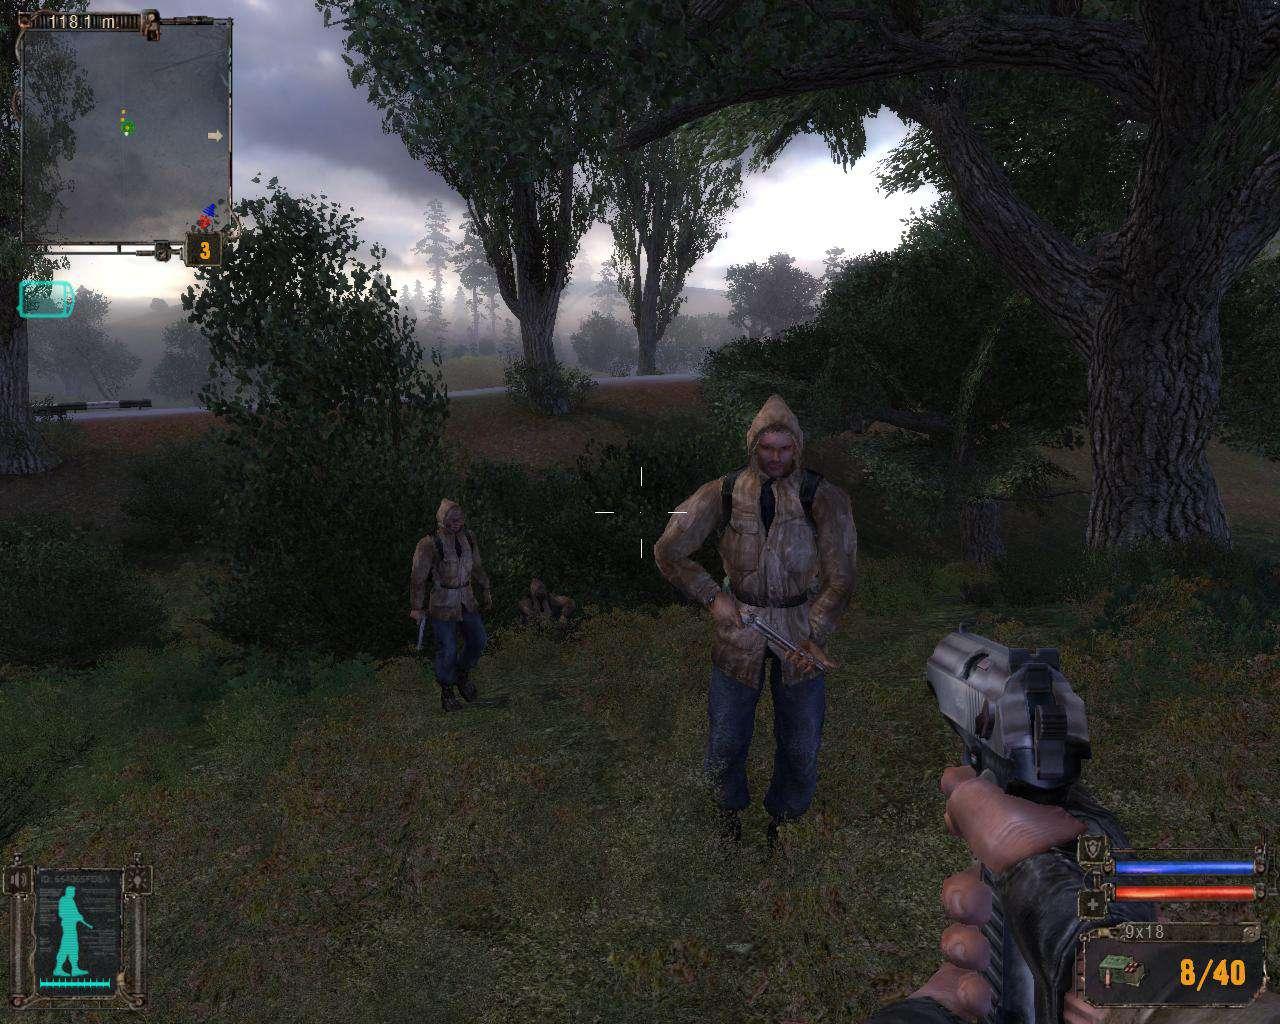 S.T.A.L.K.E.R.: Тень Чернобыля (скриншот игры)